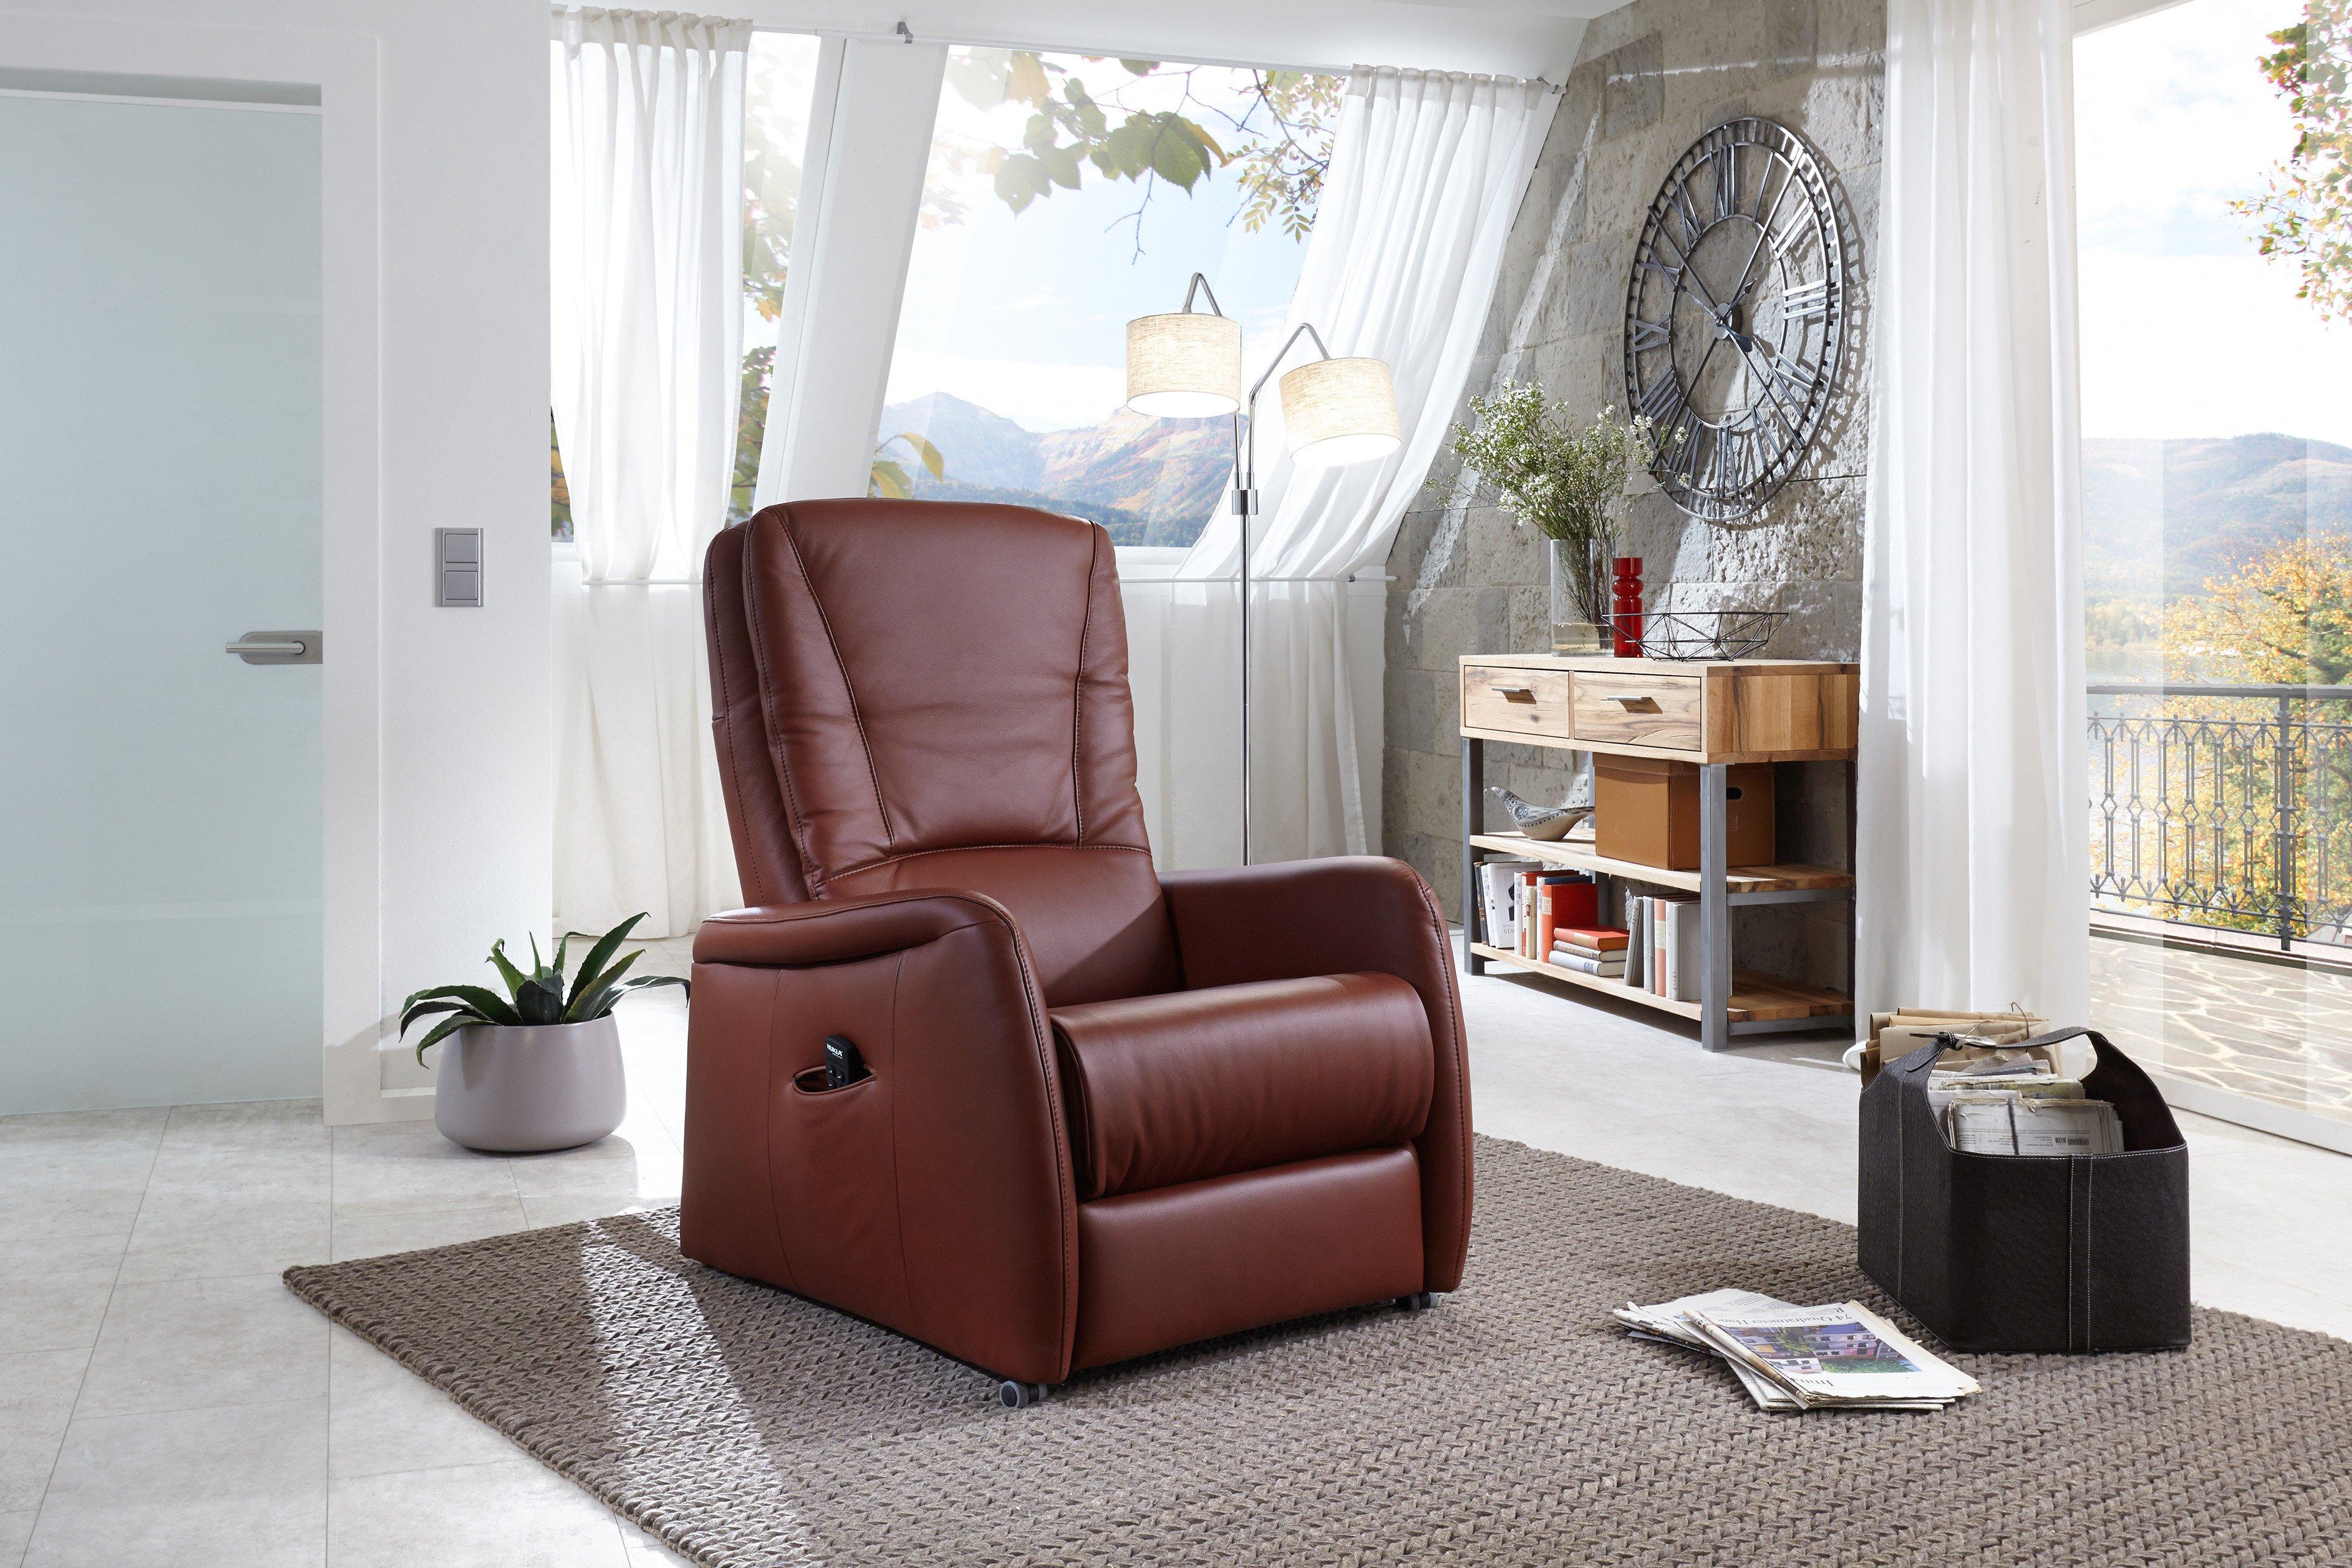 hukla ap02 tv sessel in rot braun m bel letz ihr. Black Bedroom Furniture Sets. Home Design Ideas